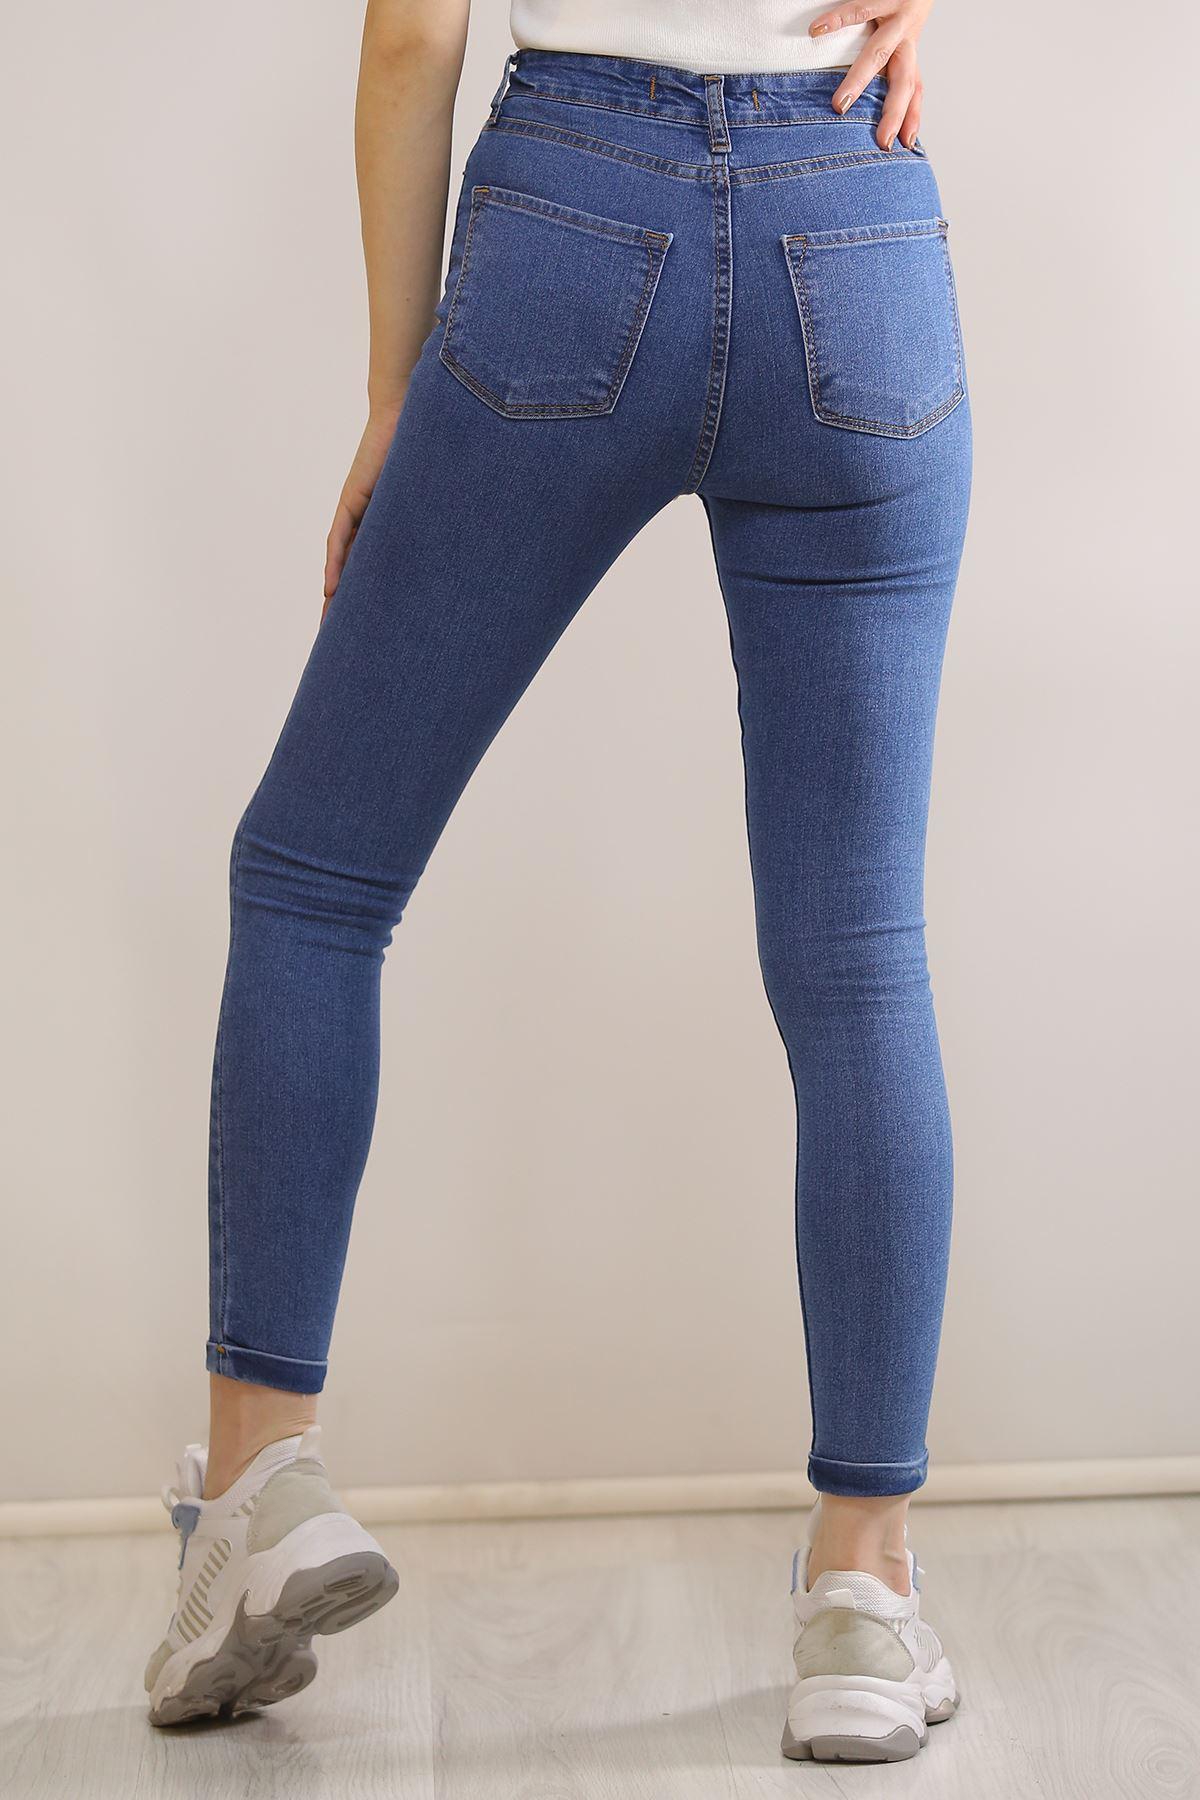 Tırnaklı Kot Pantolon Mavi - 5794.299.